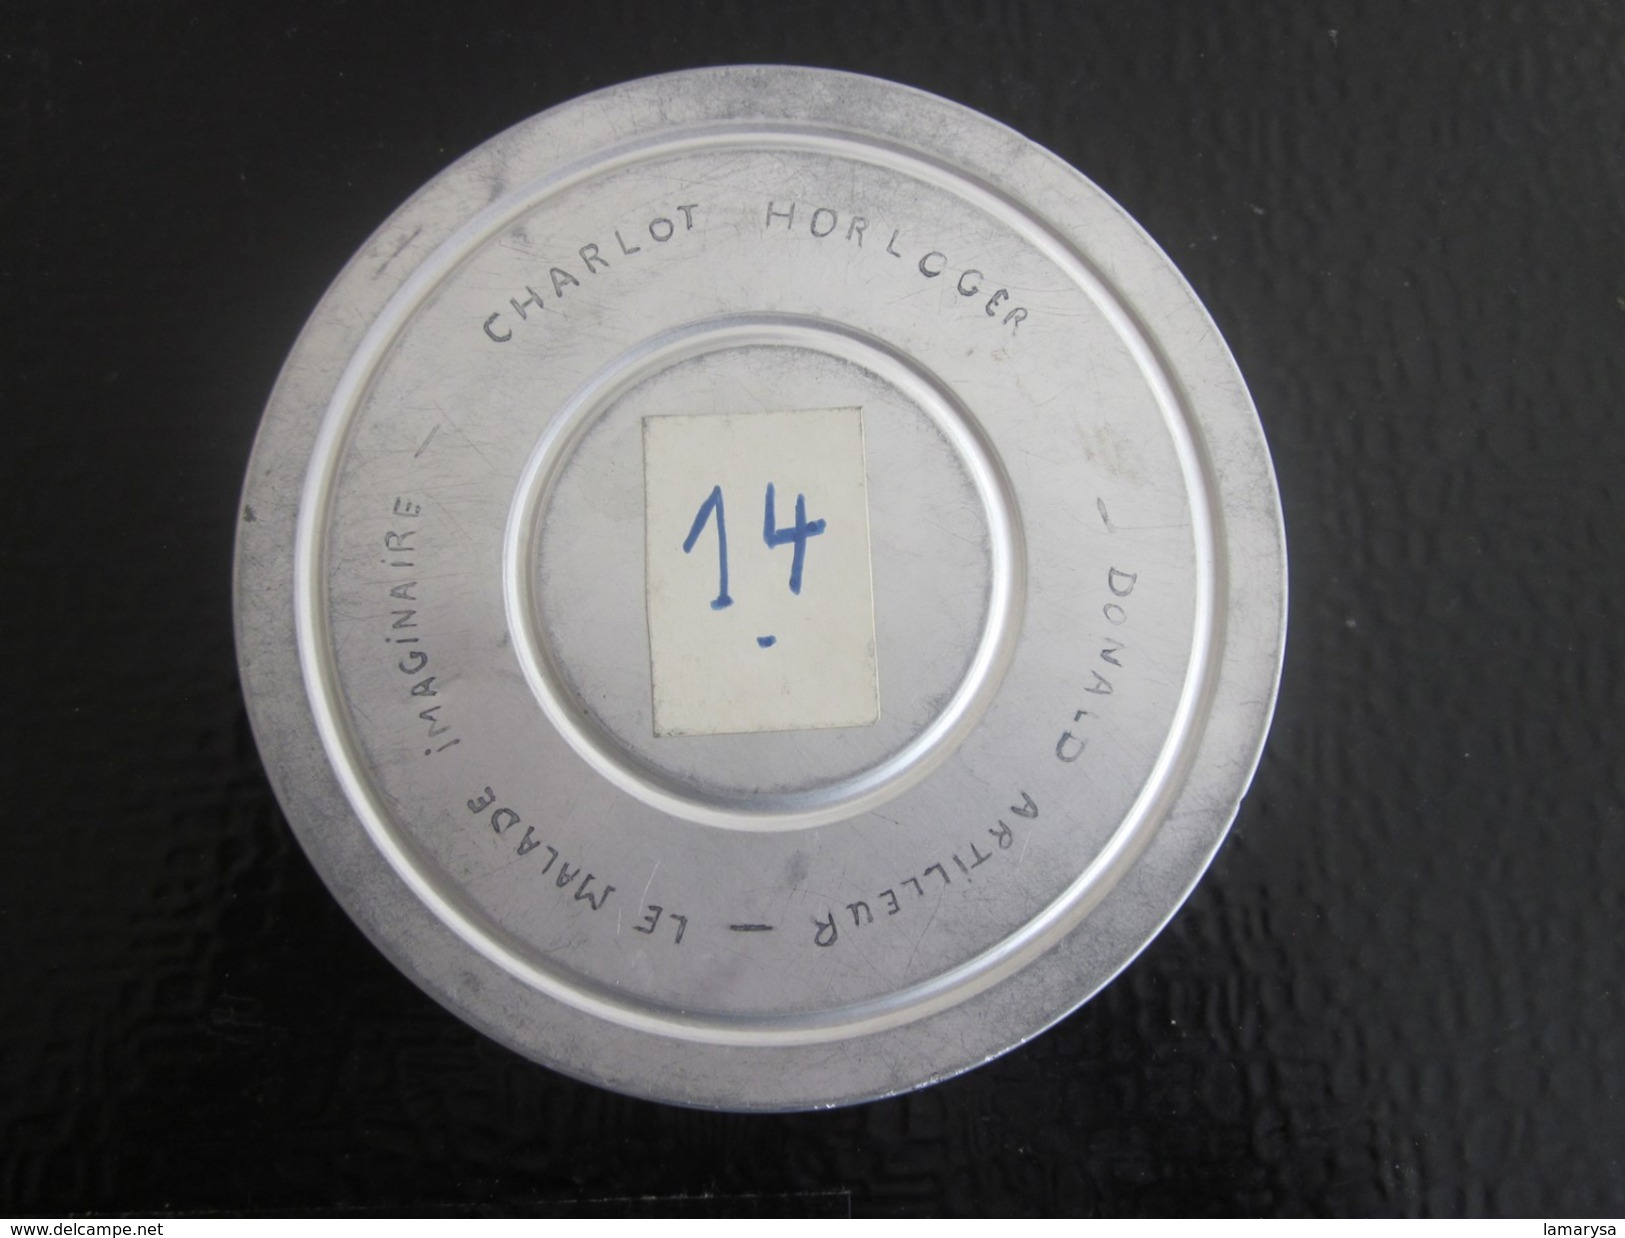 1957 BOBINE  FILM KODAK 8 Mm 1-CHARLIE CHAPLIN CHARLOT HORLOGER-2-LE MALADE IMAGINAIRE-3-DONALD ARTILLEUR-DISNEY VINTAGE - Bobines De Films: 35mm - 16mm - 9,5+8+S8mm